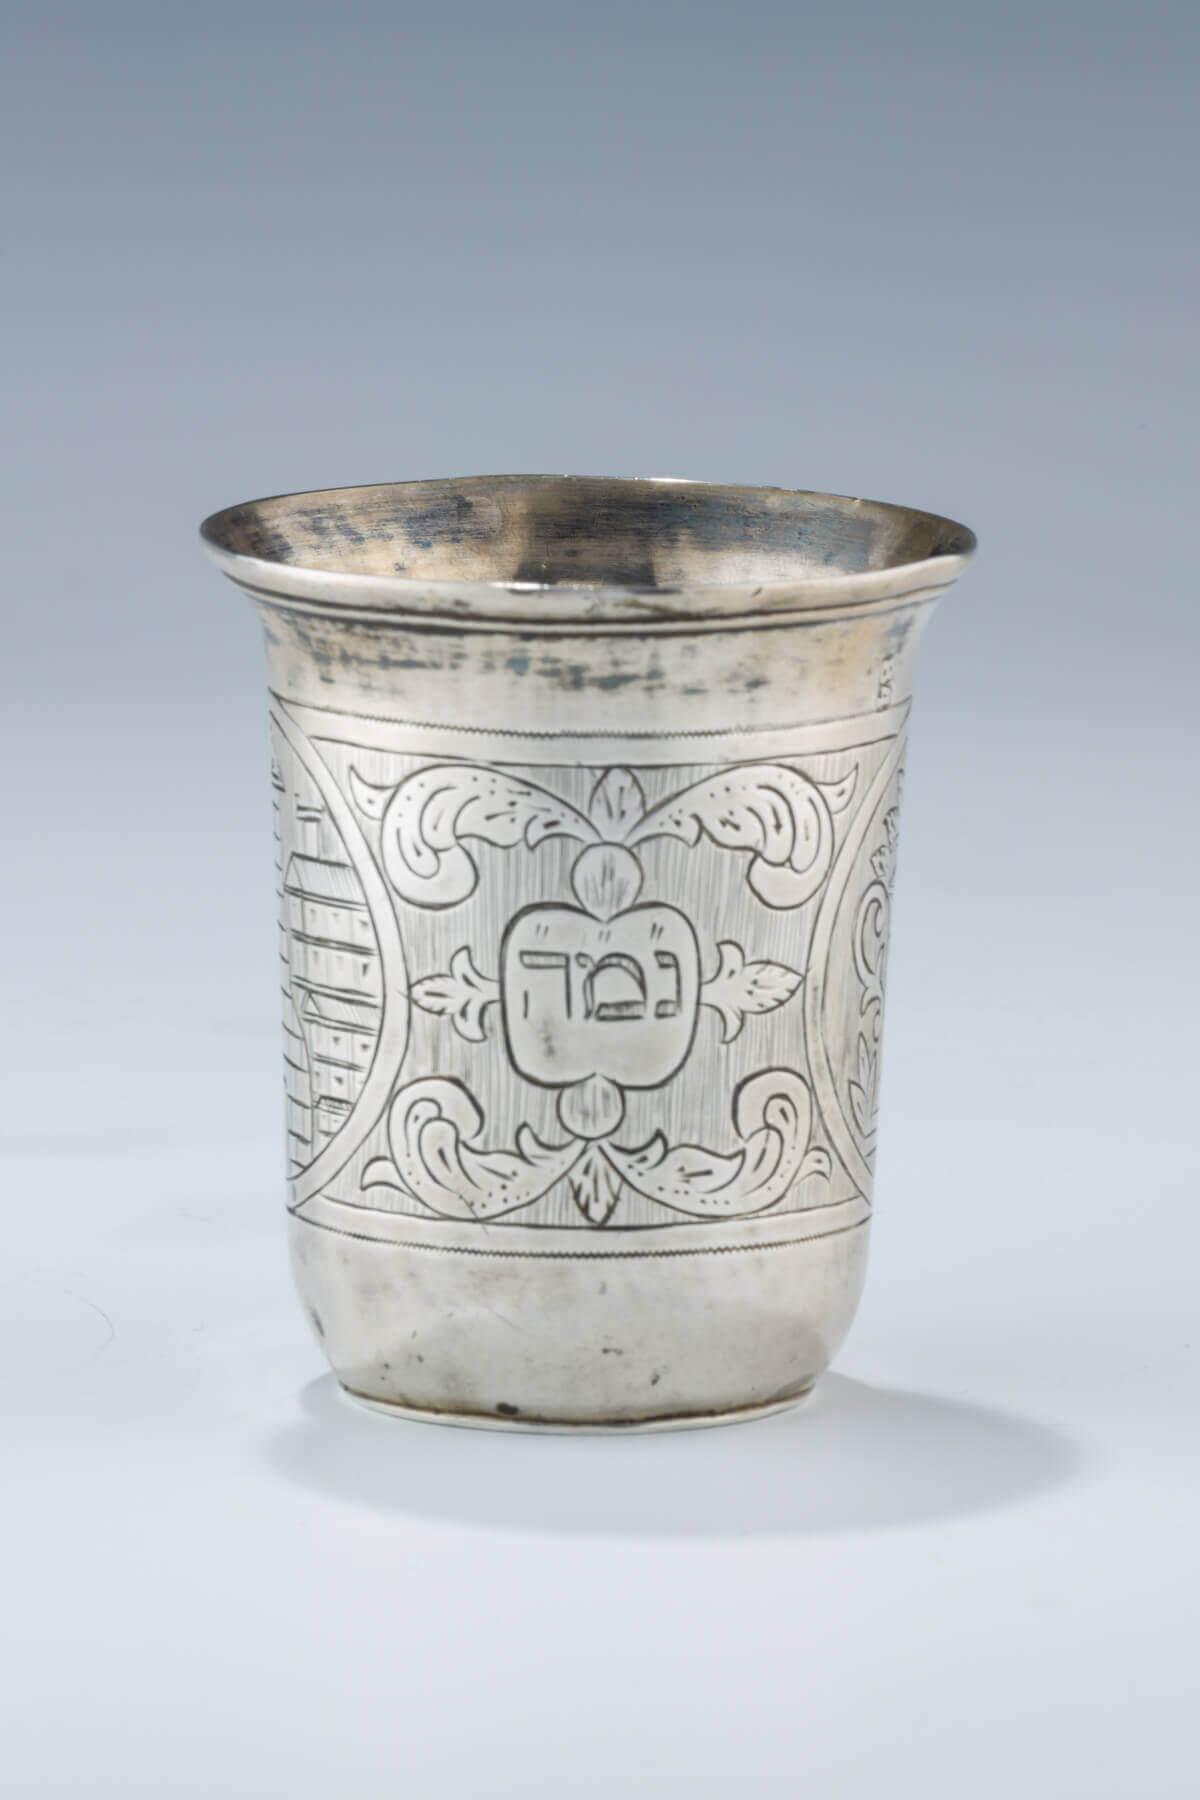 031. A SILVER SHMIROTH KIDDUSH CUP